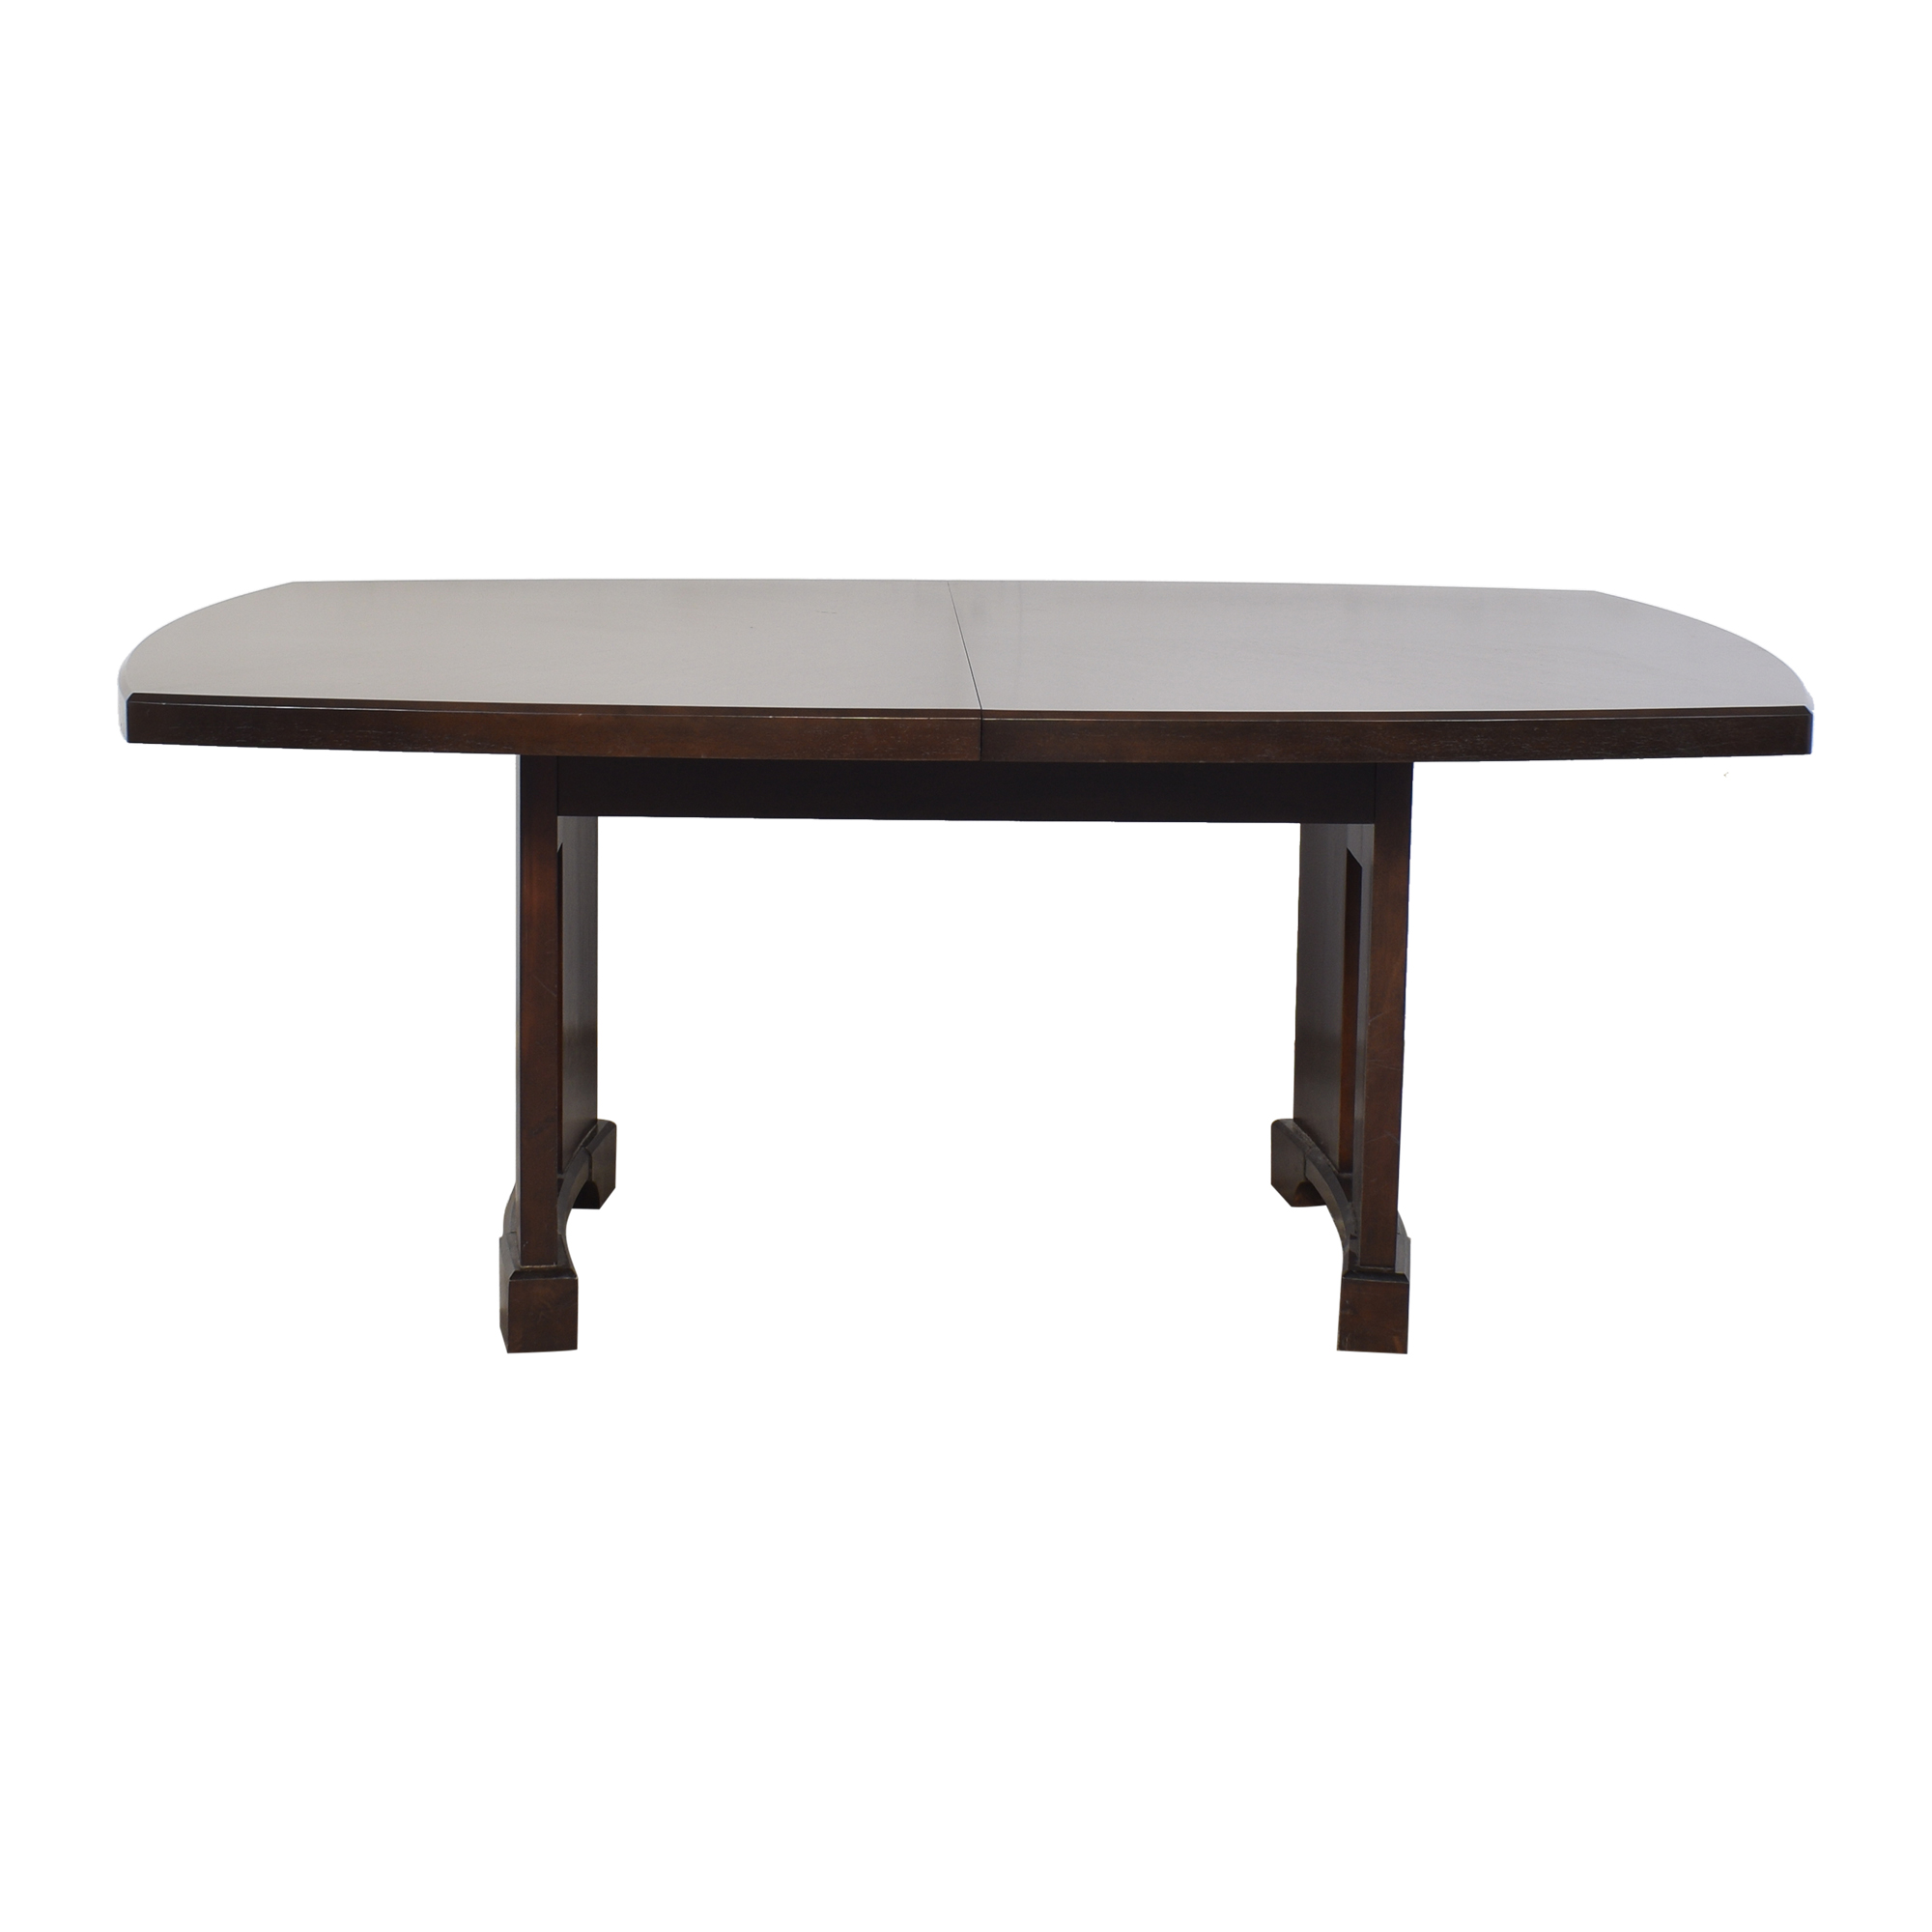 Casana Furniture Casana Extendable Dining Table ma